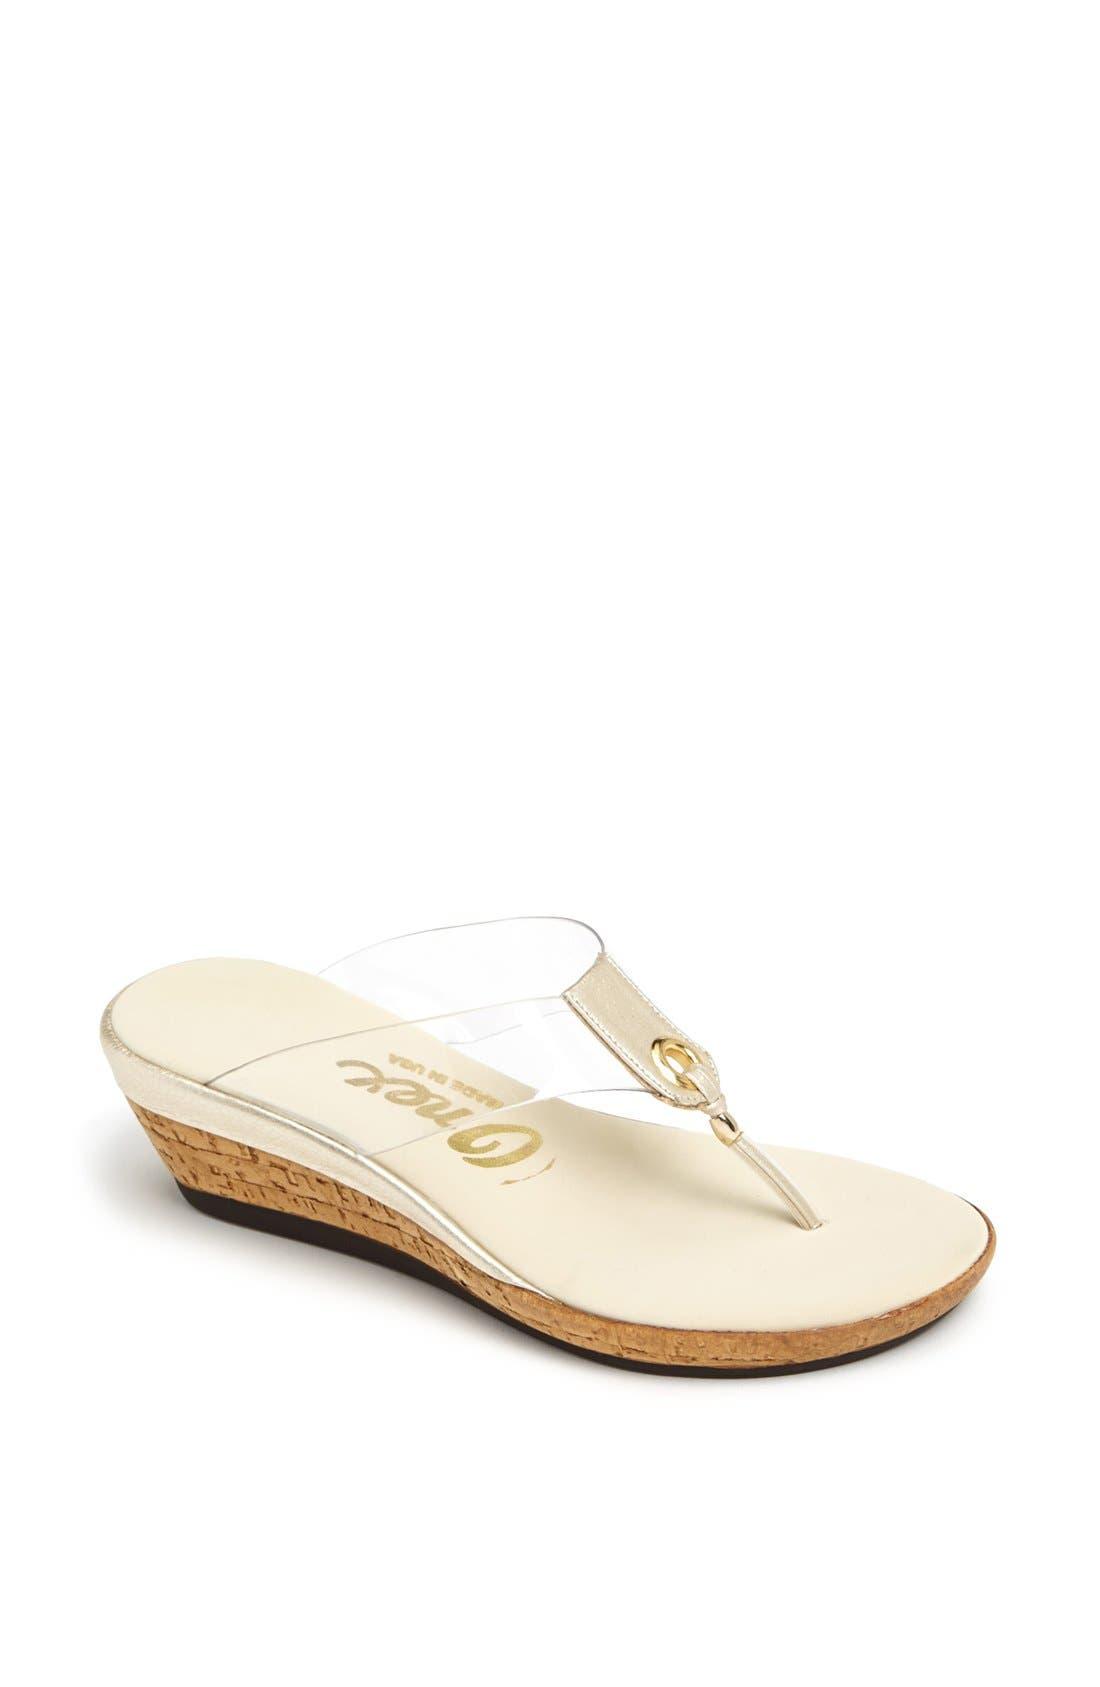 Alternate Image 1 Selected - Onex 'Brucie' Wedge Sandal